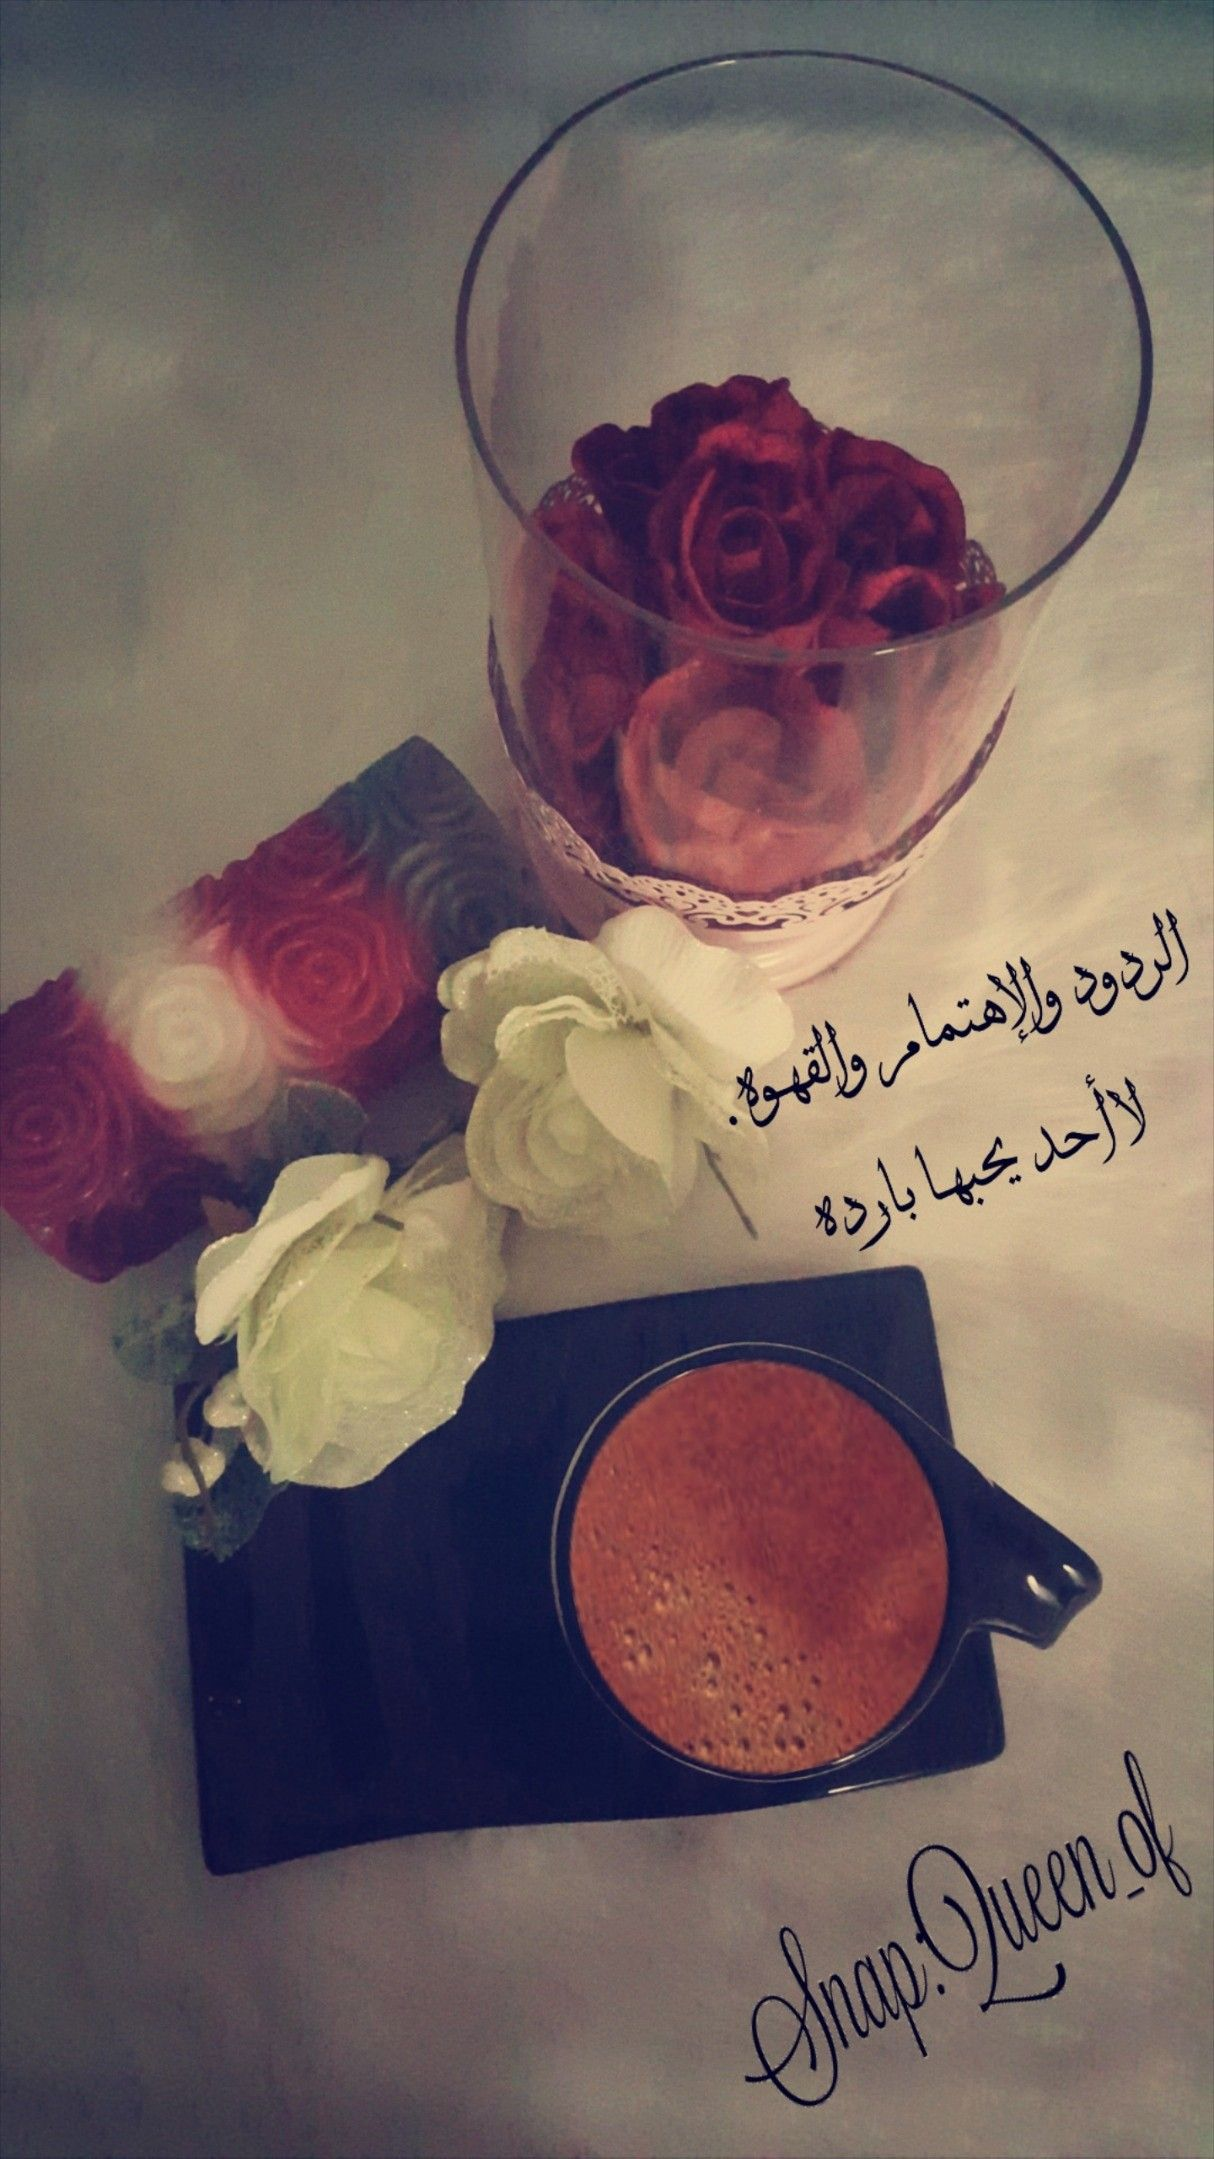 Pin By سيده الذوق On سناب شات سنابي تابعوني Alcoholic Drinks Alcohol Rose Wine